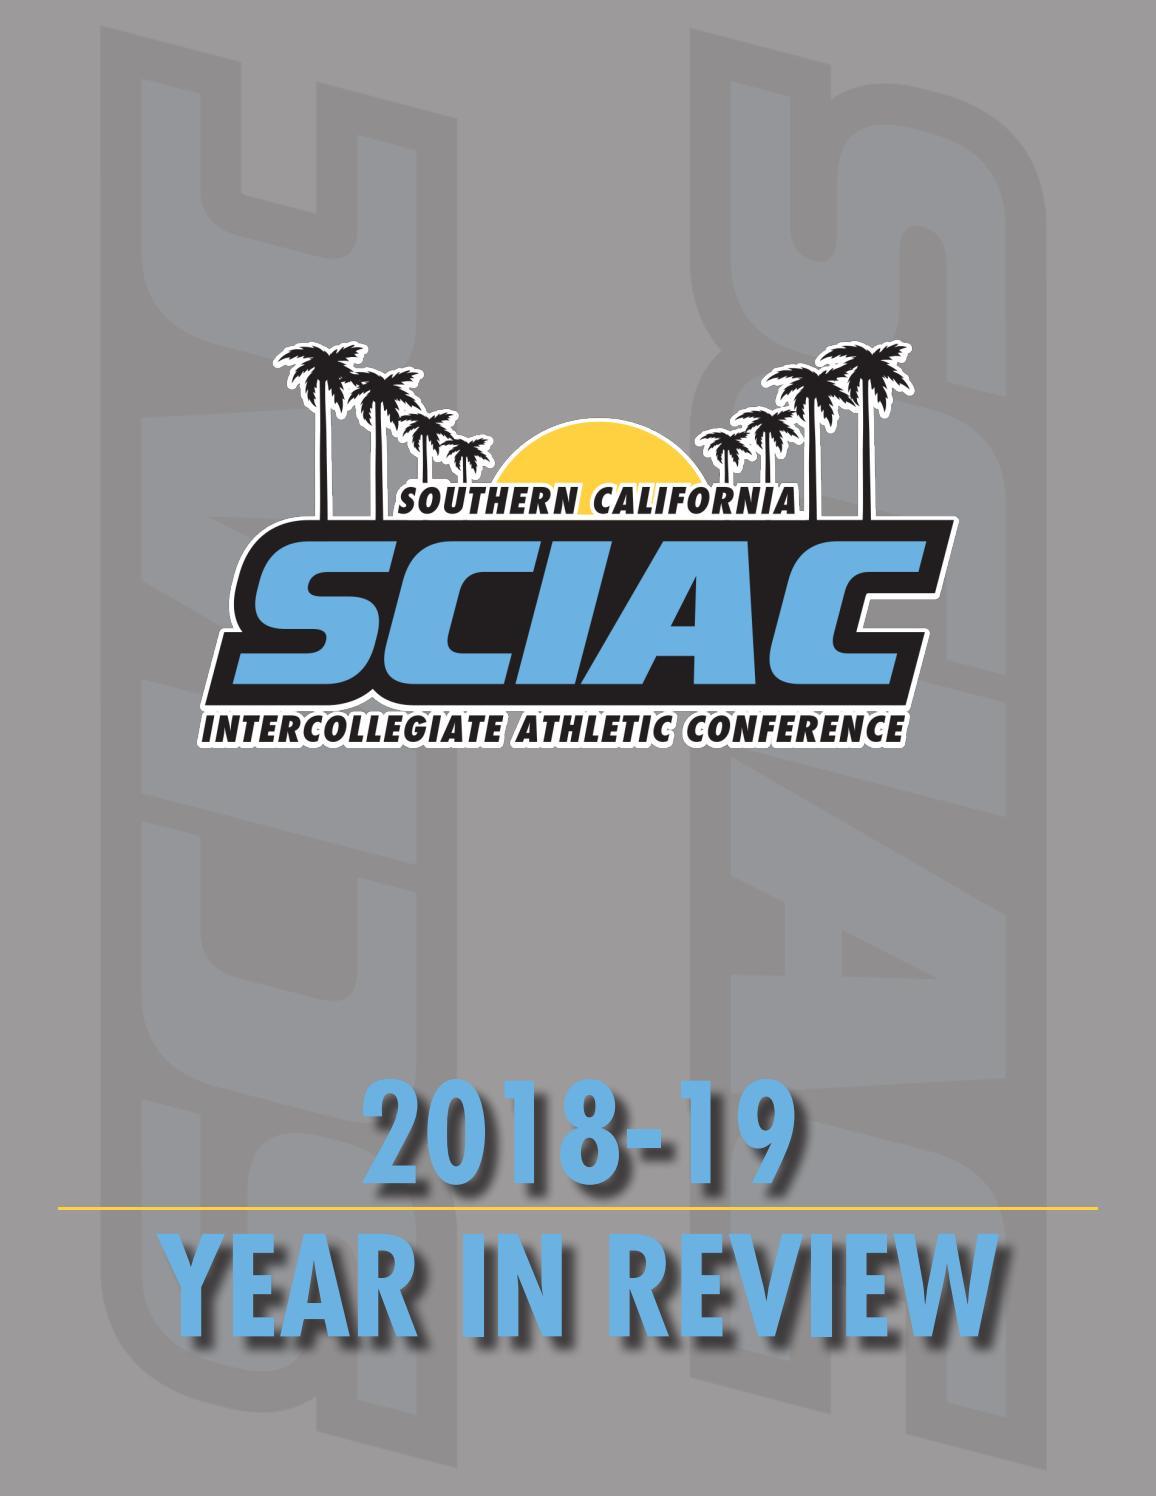 SCIAC 2018-19 Year in Review by SCIAC - issuu